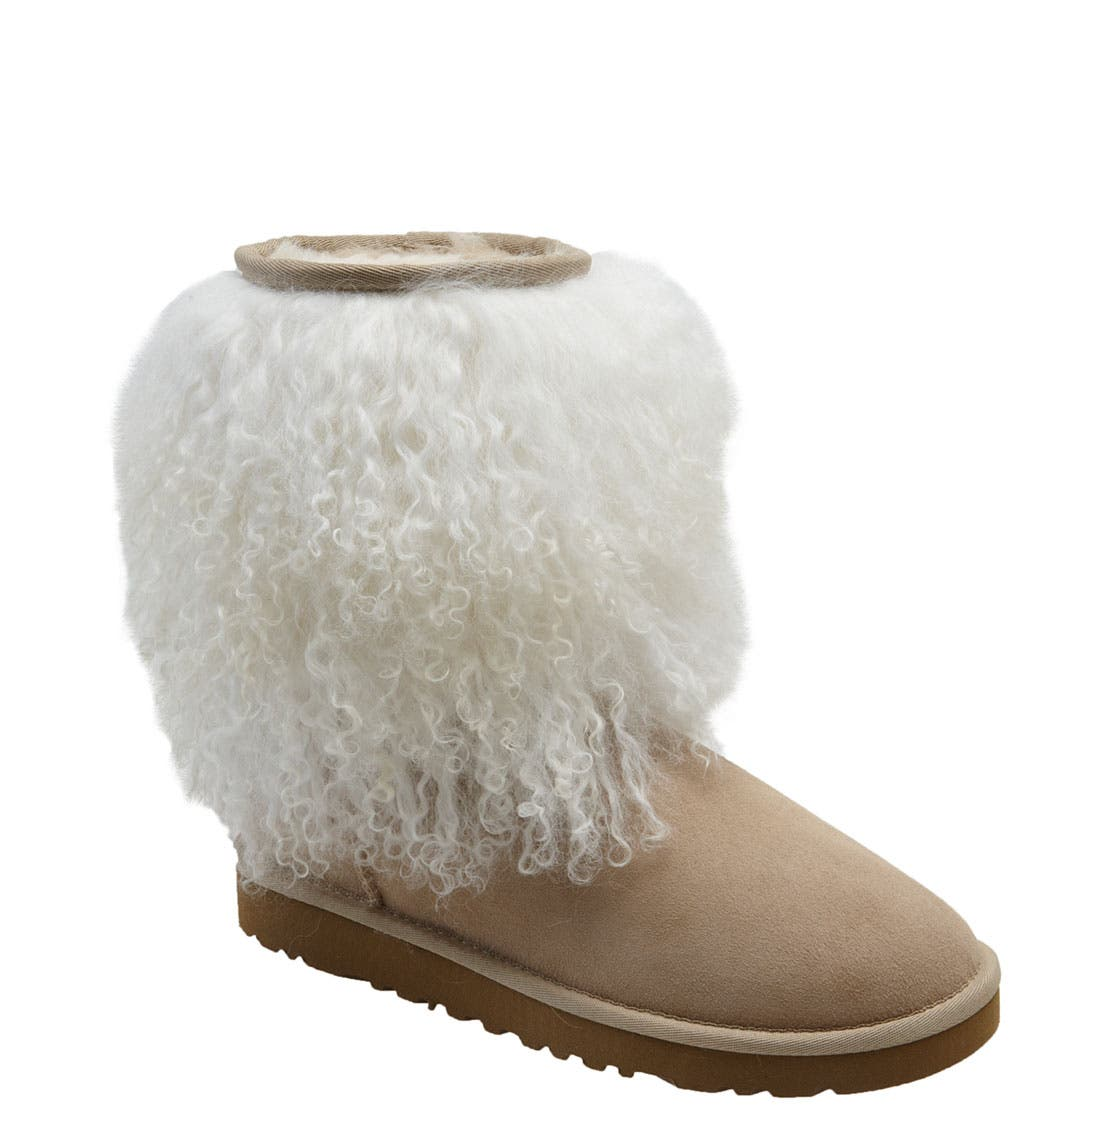 Main Image - UGG® Australia Shearling Cuff Boot (Women)